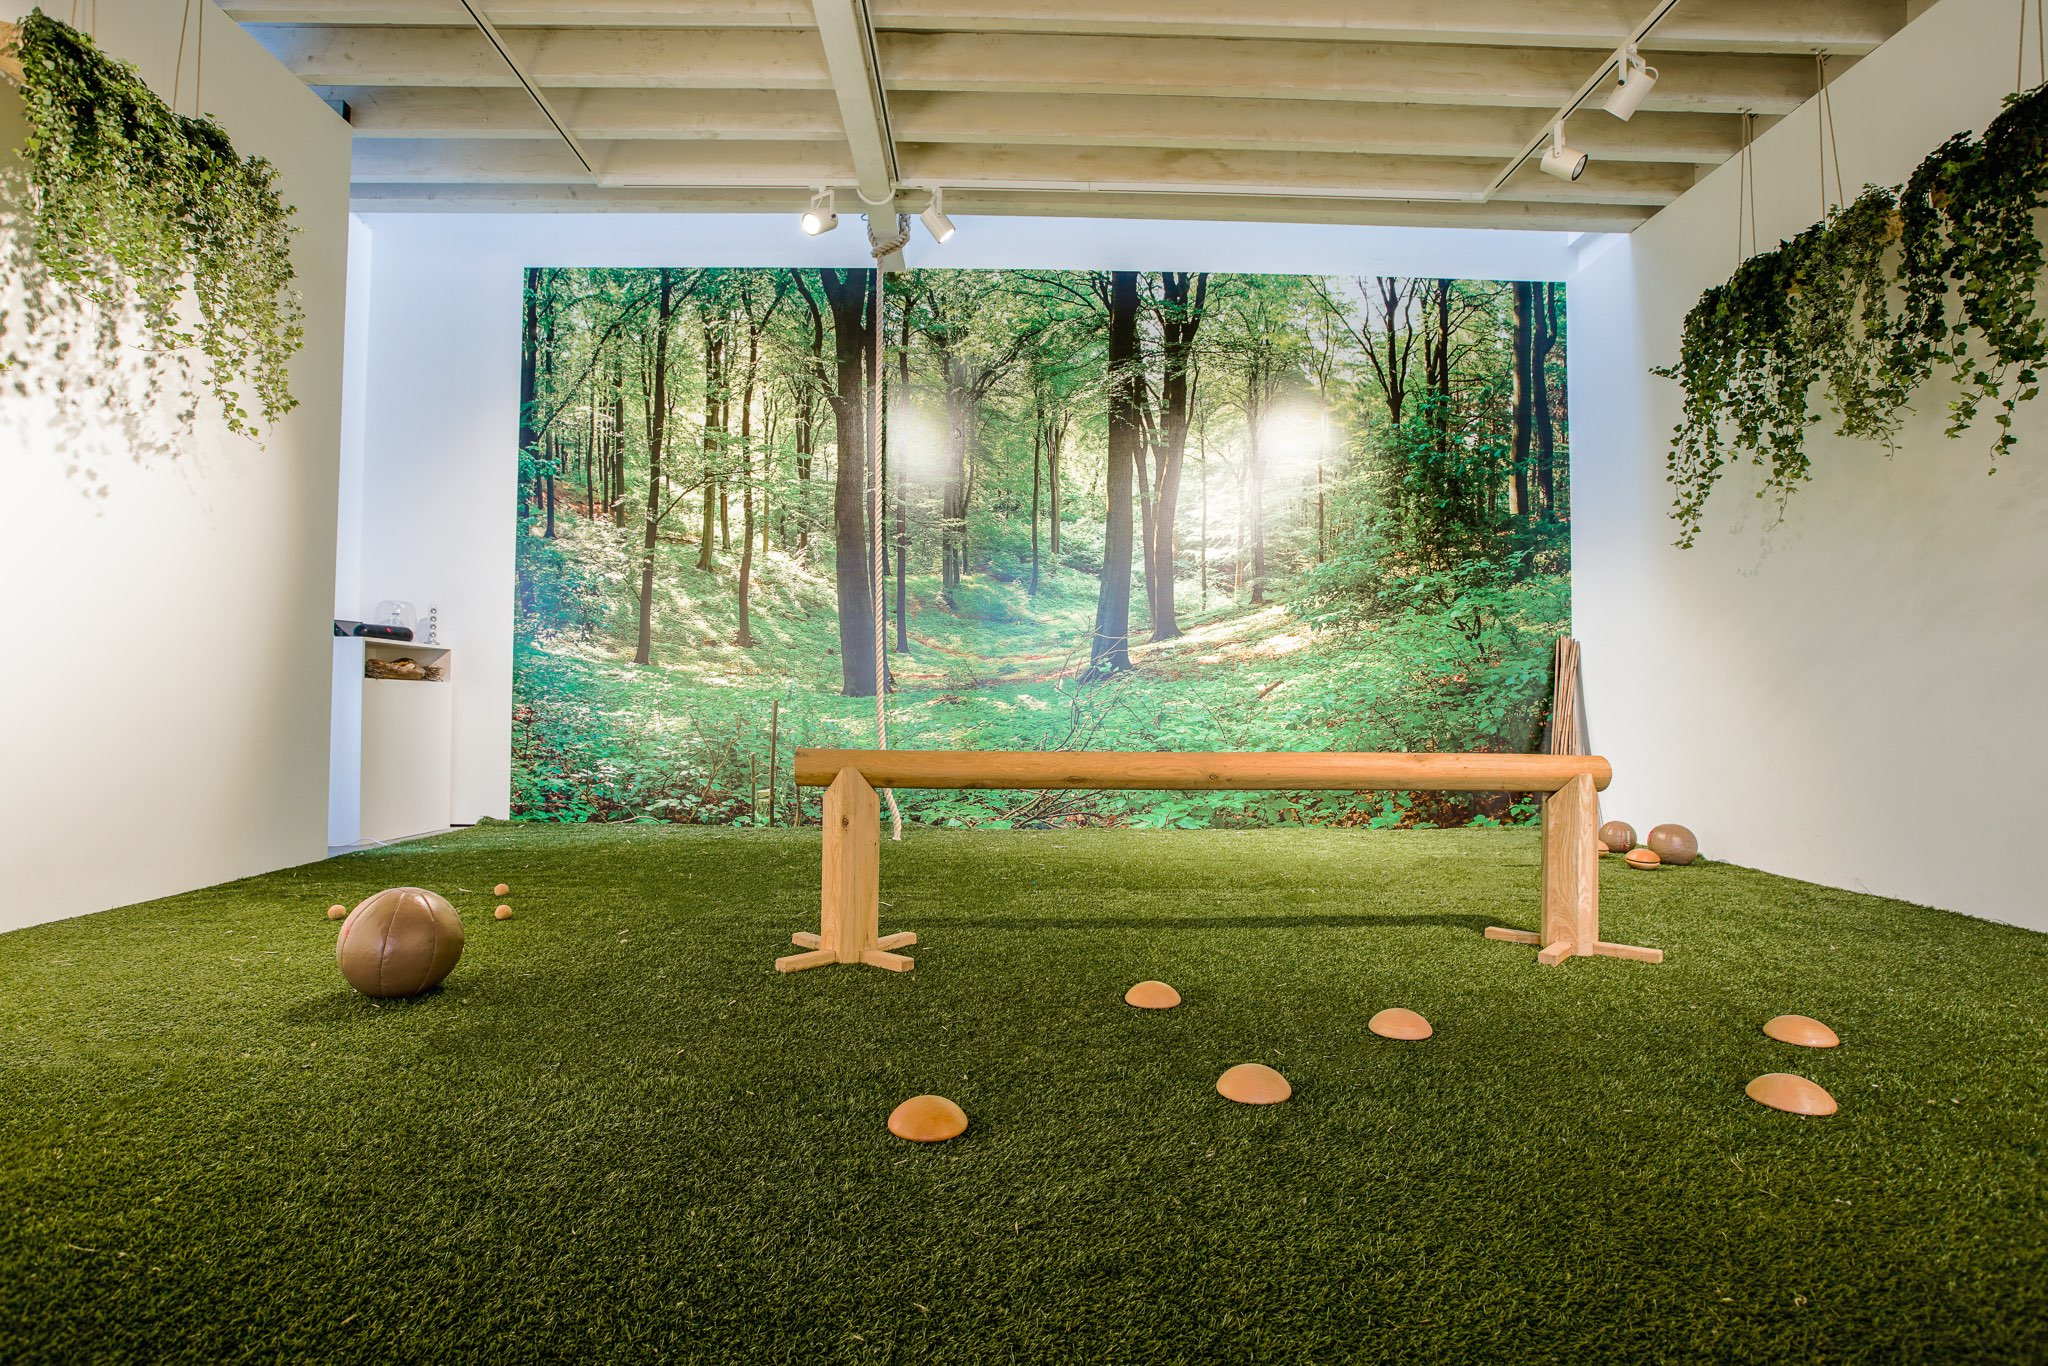 biofit biophilic nature gym london interior design.jpg